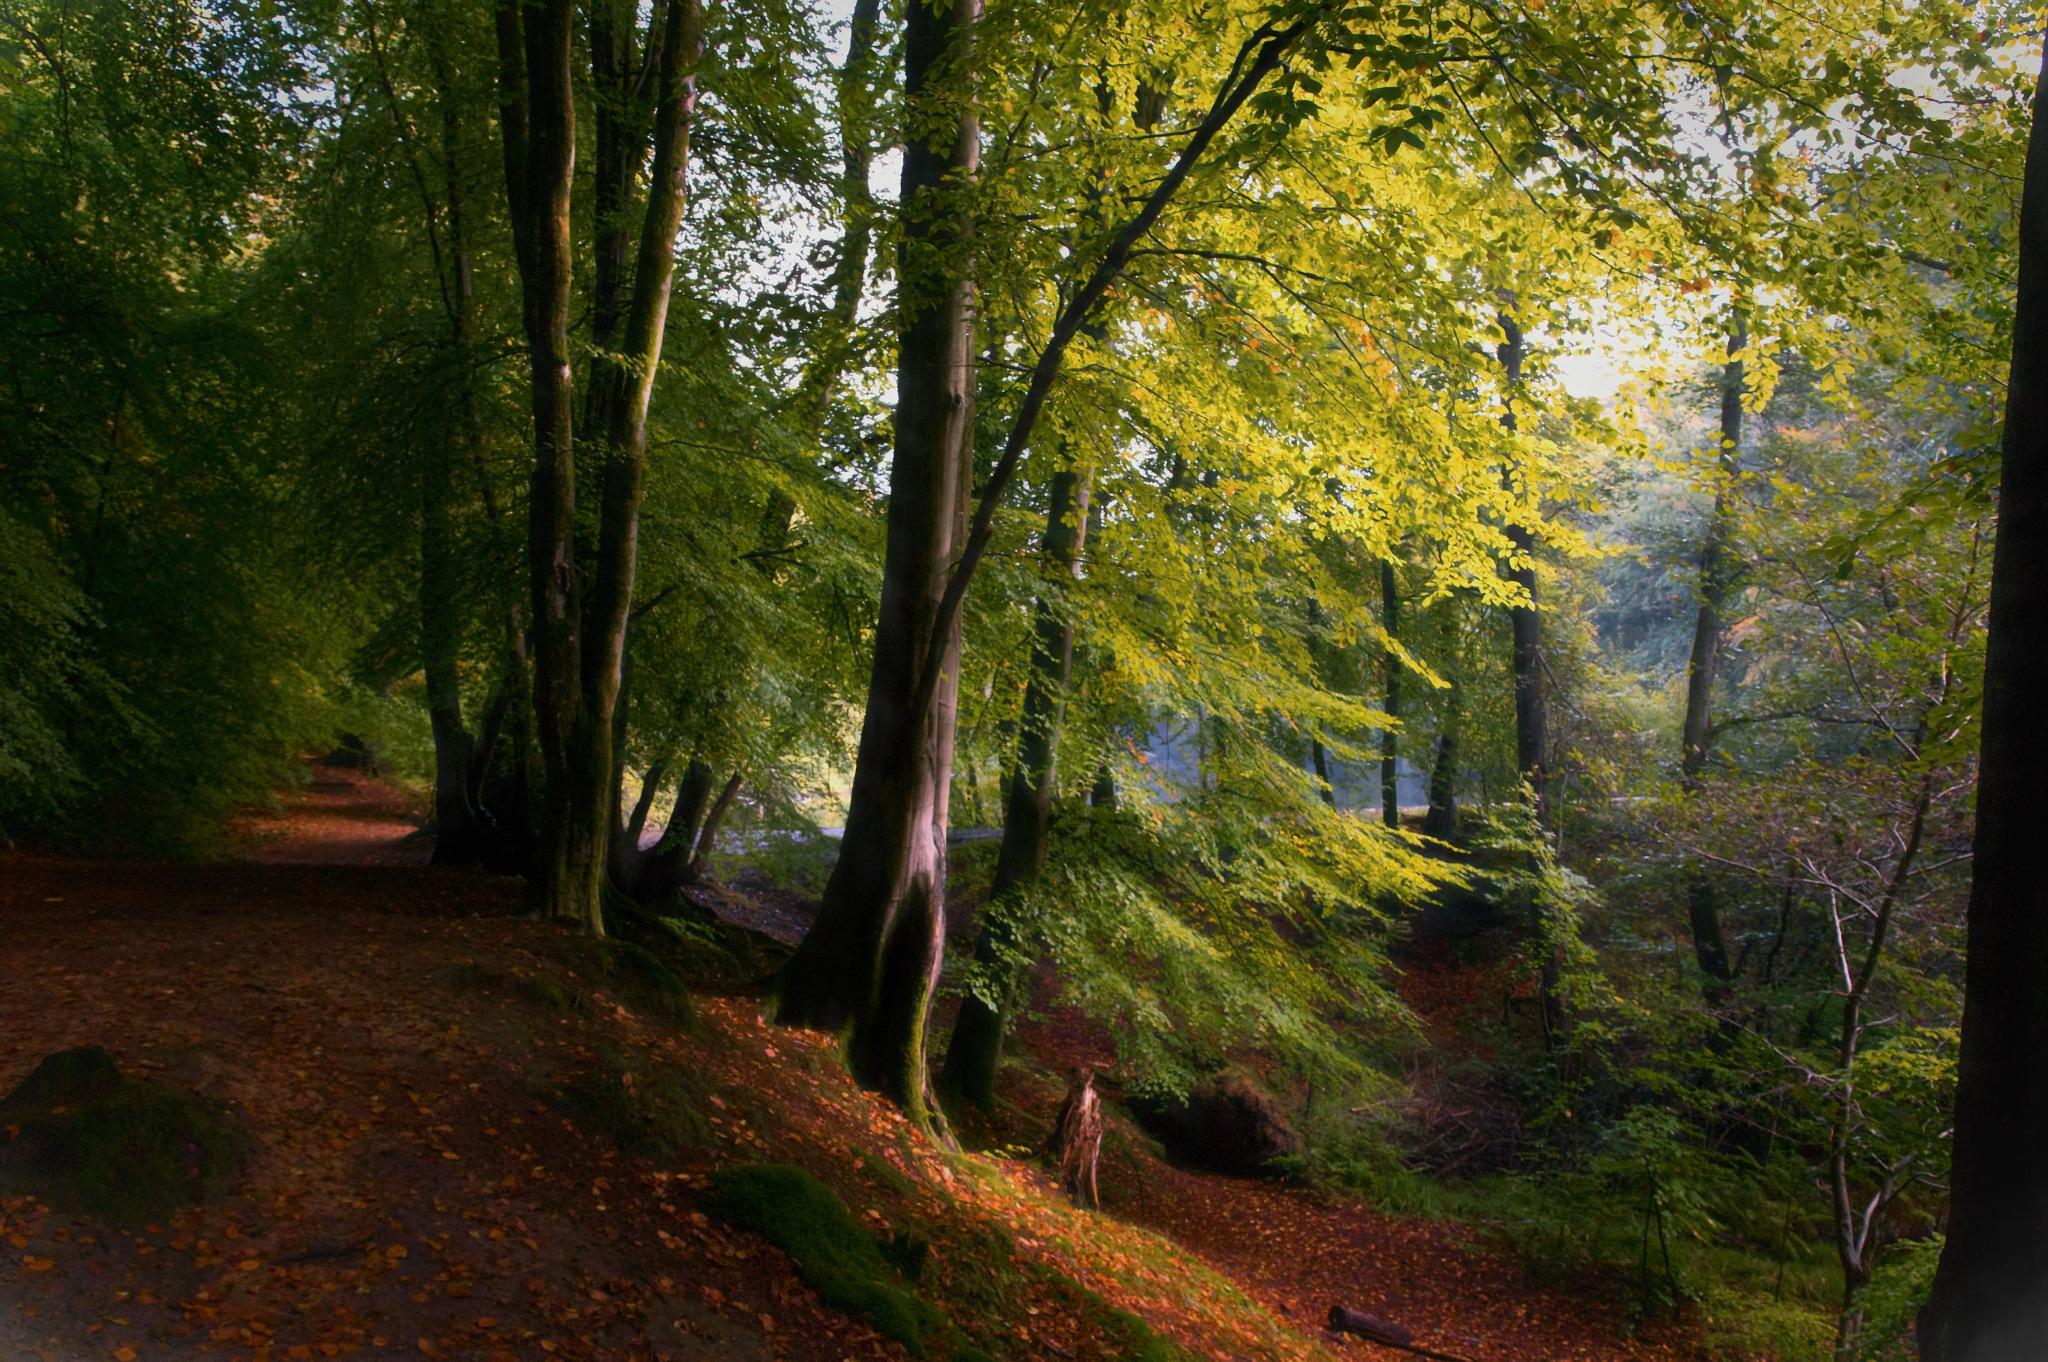 Autumn Morning by Paul Clarke